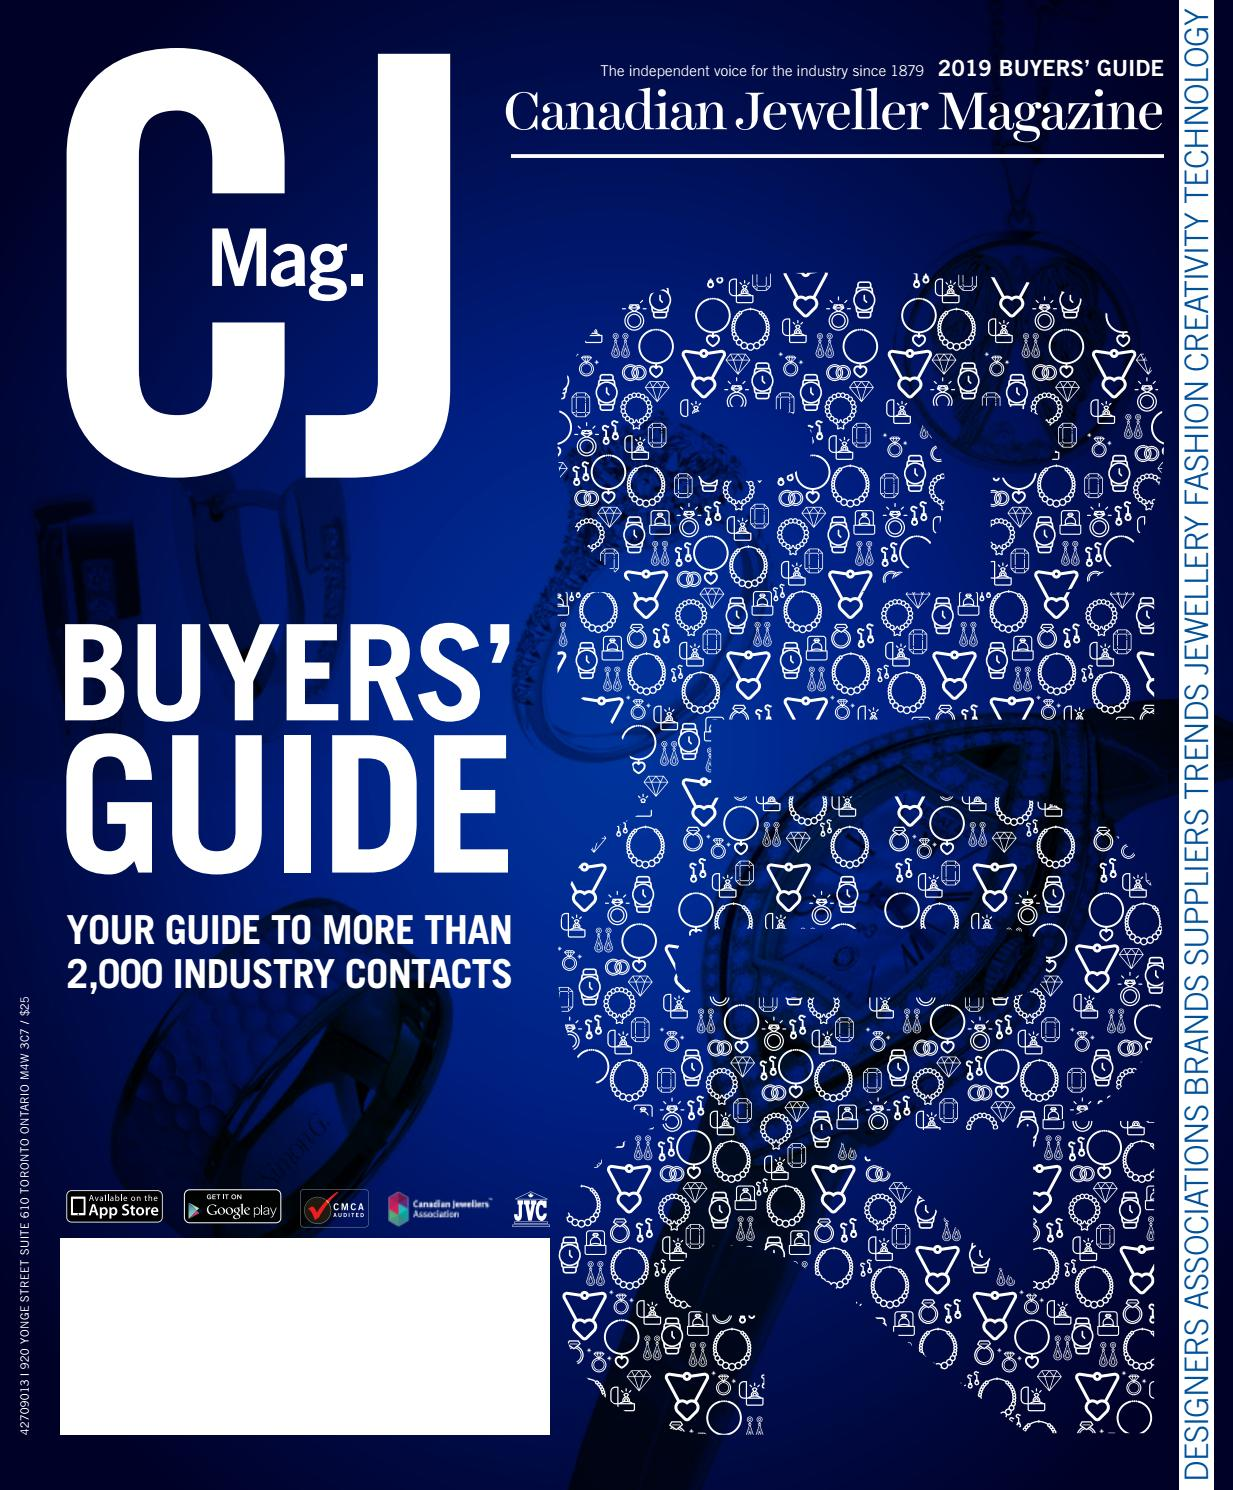 59268ddcec5456 Magazine Layout - Canadian Jeweller by Hugo Cukurs - issuu